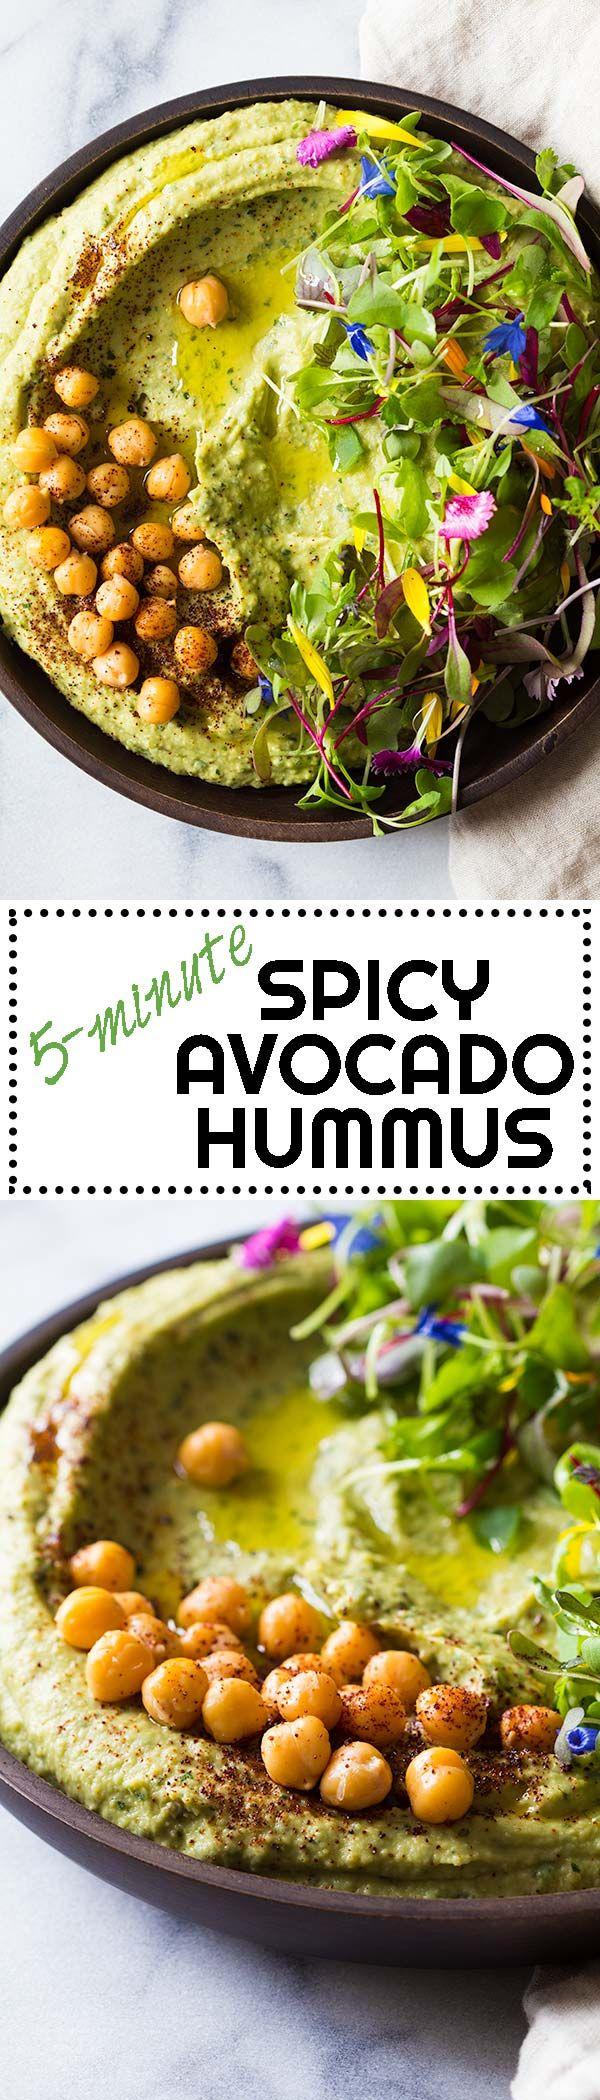 Call it what you want, Avocado Cilantro Hummus, Spicy Avocado Hummus, or 5-minute Hummus, one thing is for sure, this hummus tastes freakin' fenomenal! via @greenhealthycoo